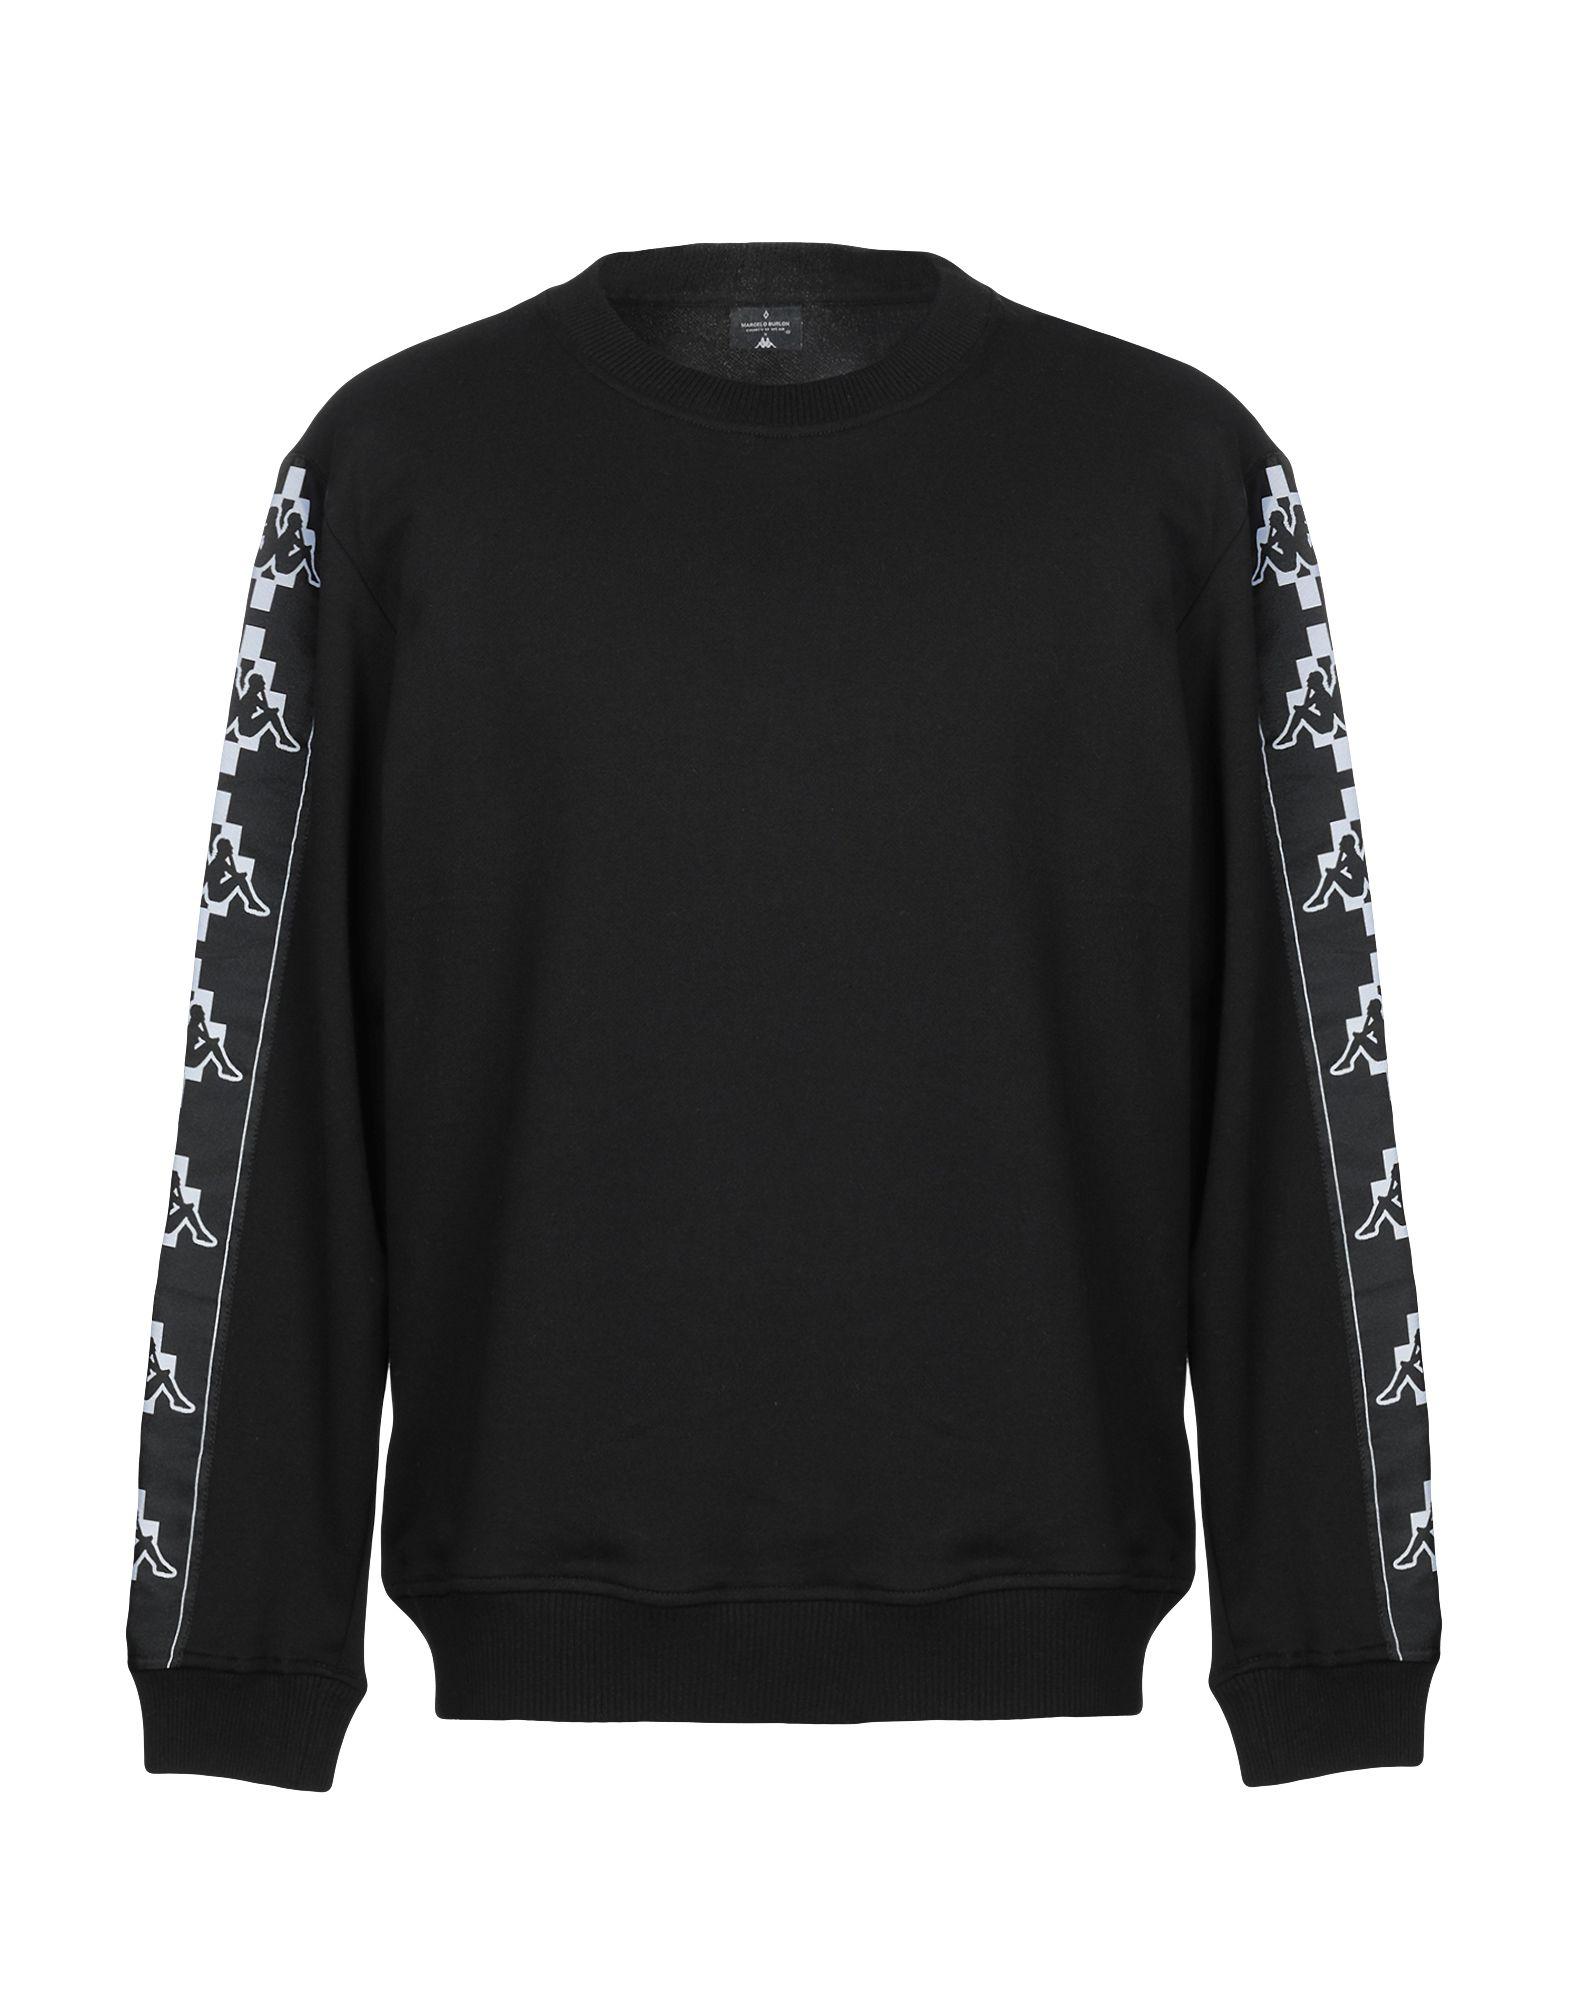 5860ef850aff Marcelo Burlon X Kappa Sweatshirt - Men Marcelo Burlon X Kappa ...